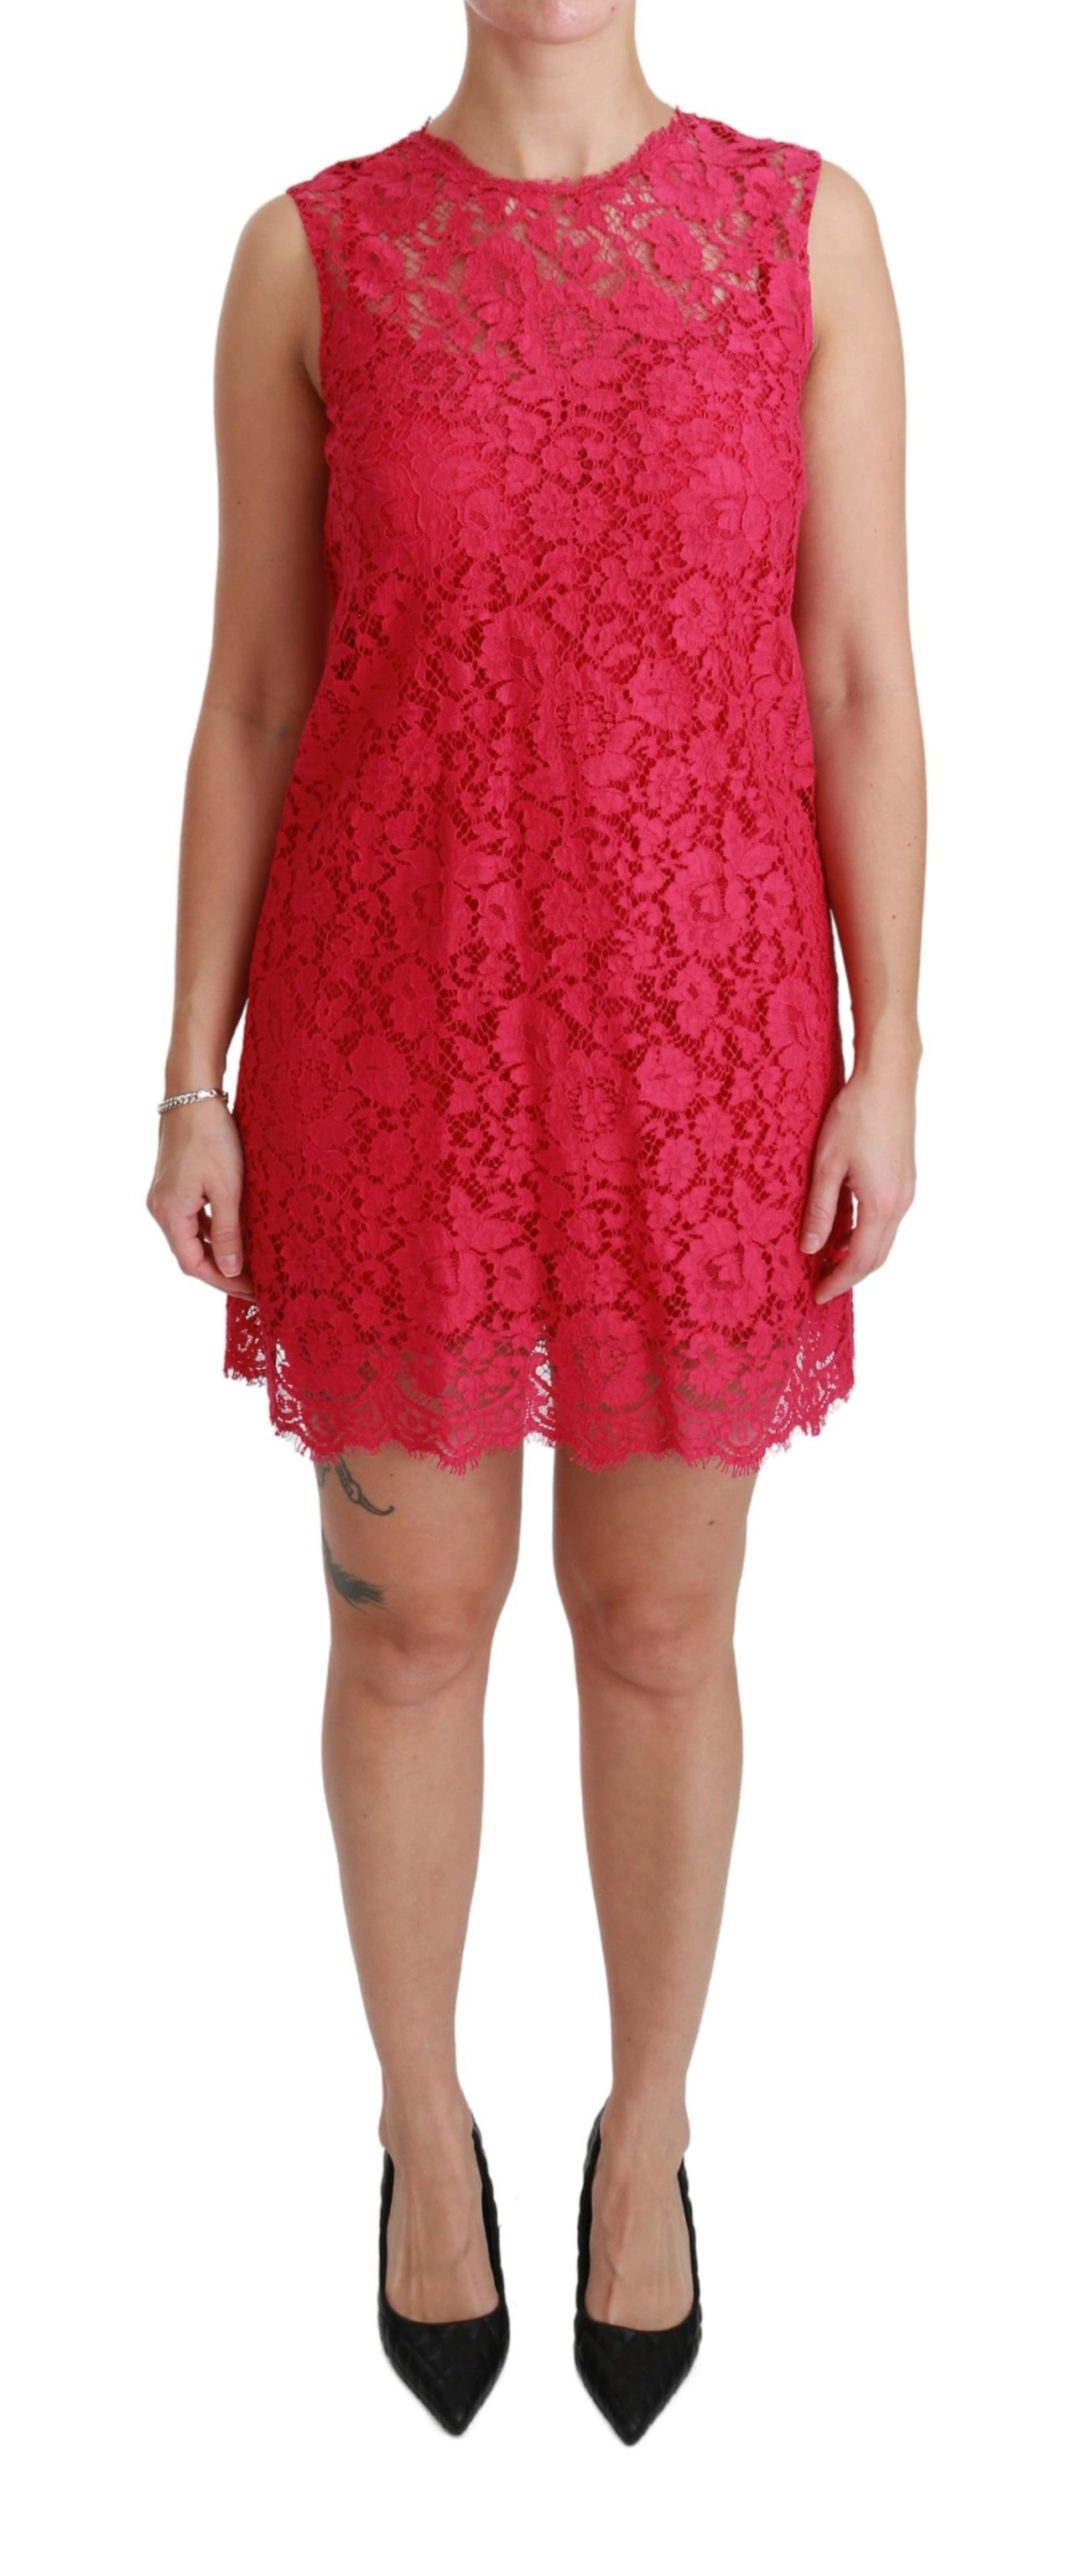 Dolce & Gabbana Women's Floral Lace Shift Gown Mini Dress Pink DR2465 - IT36 | XS